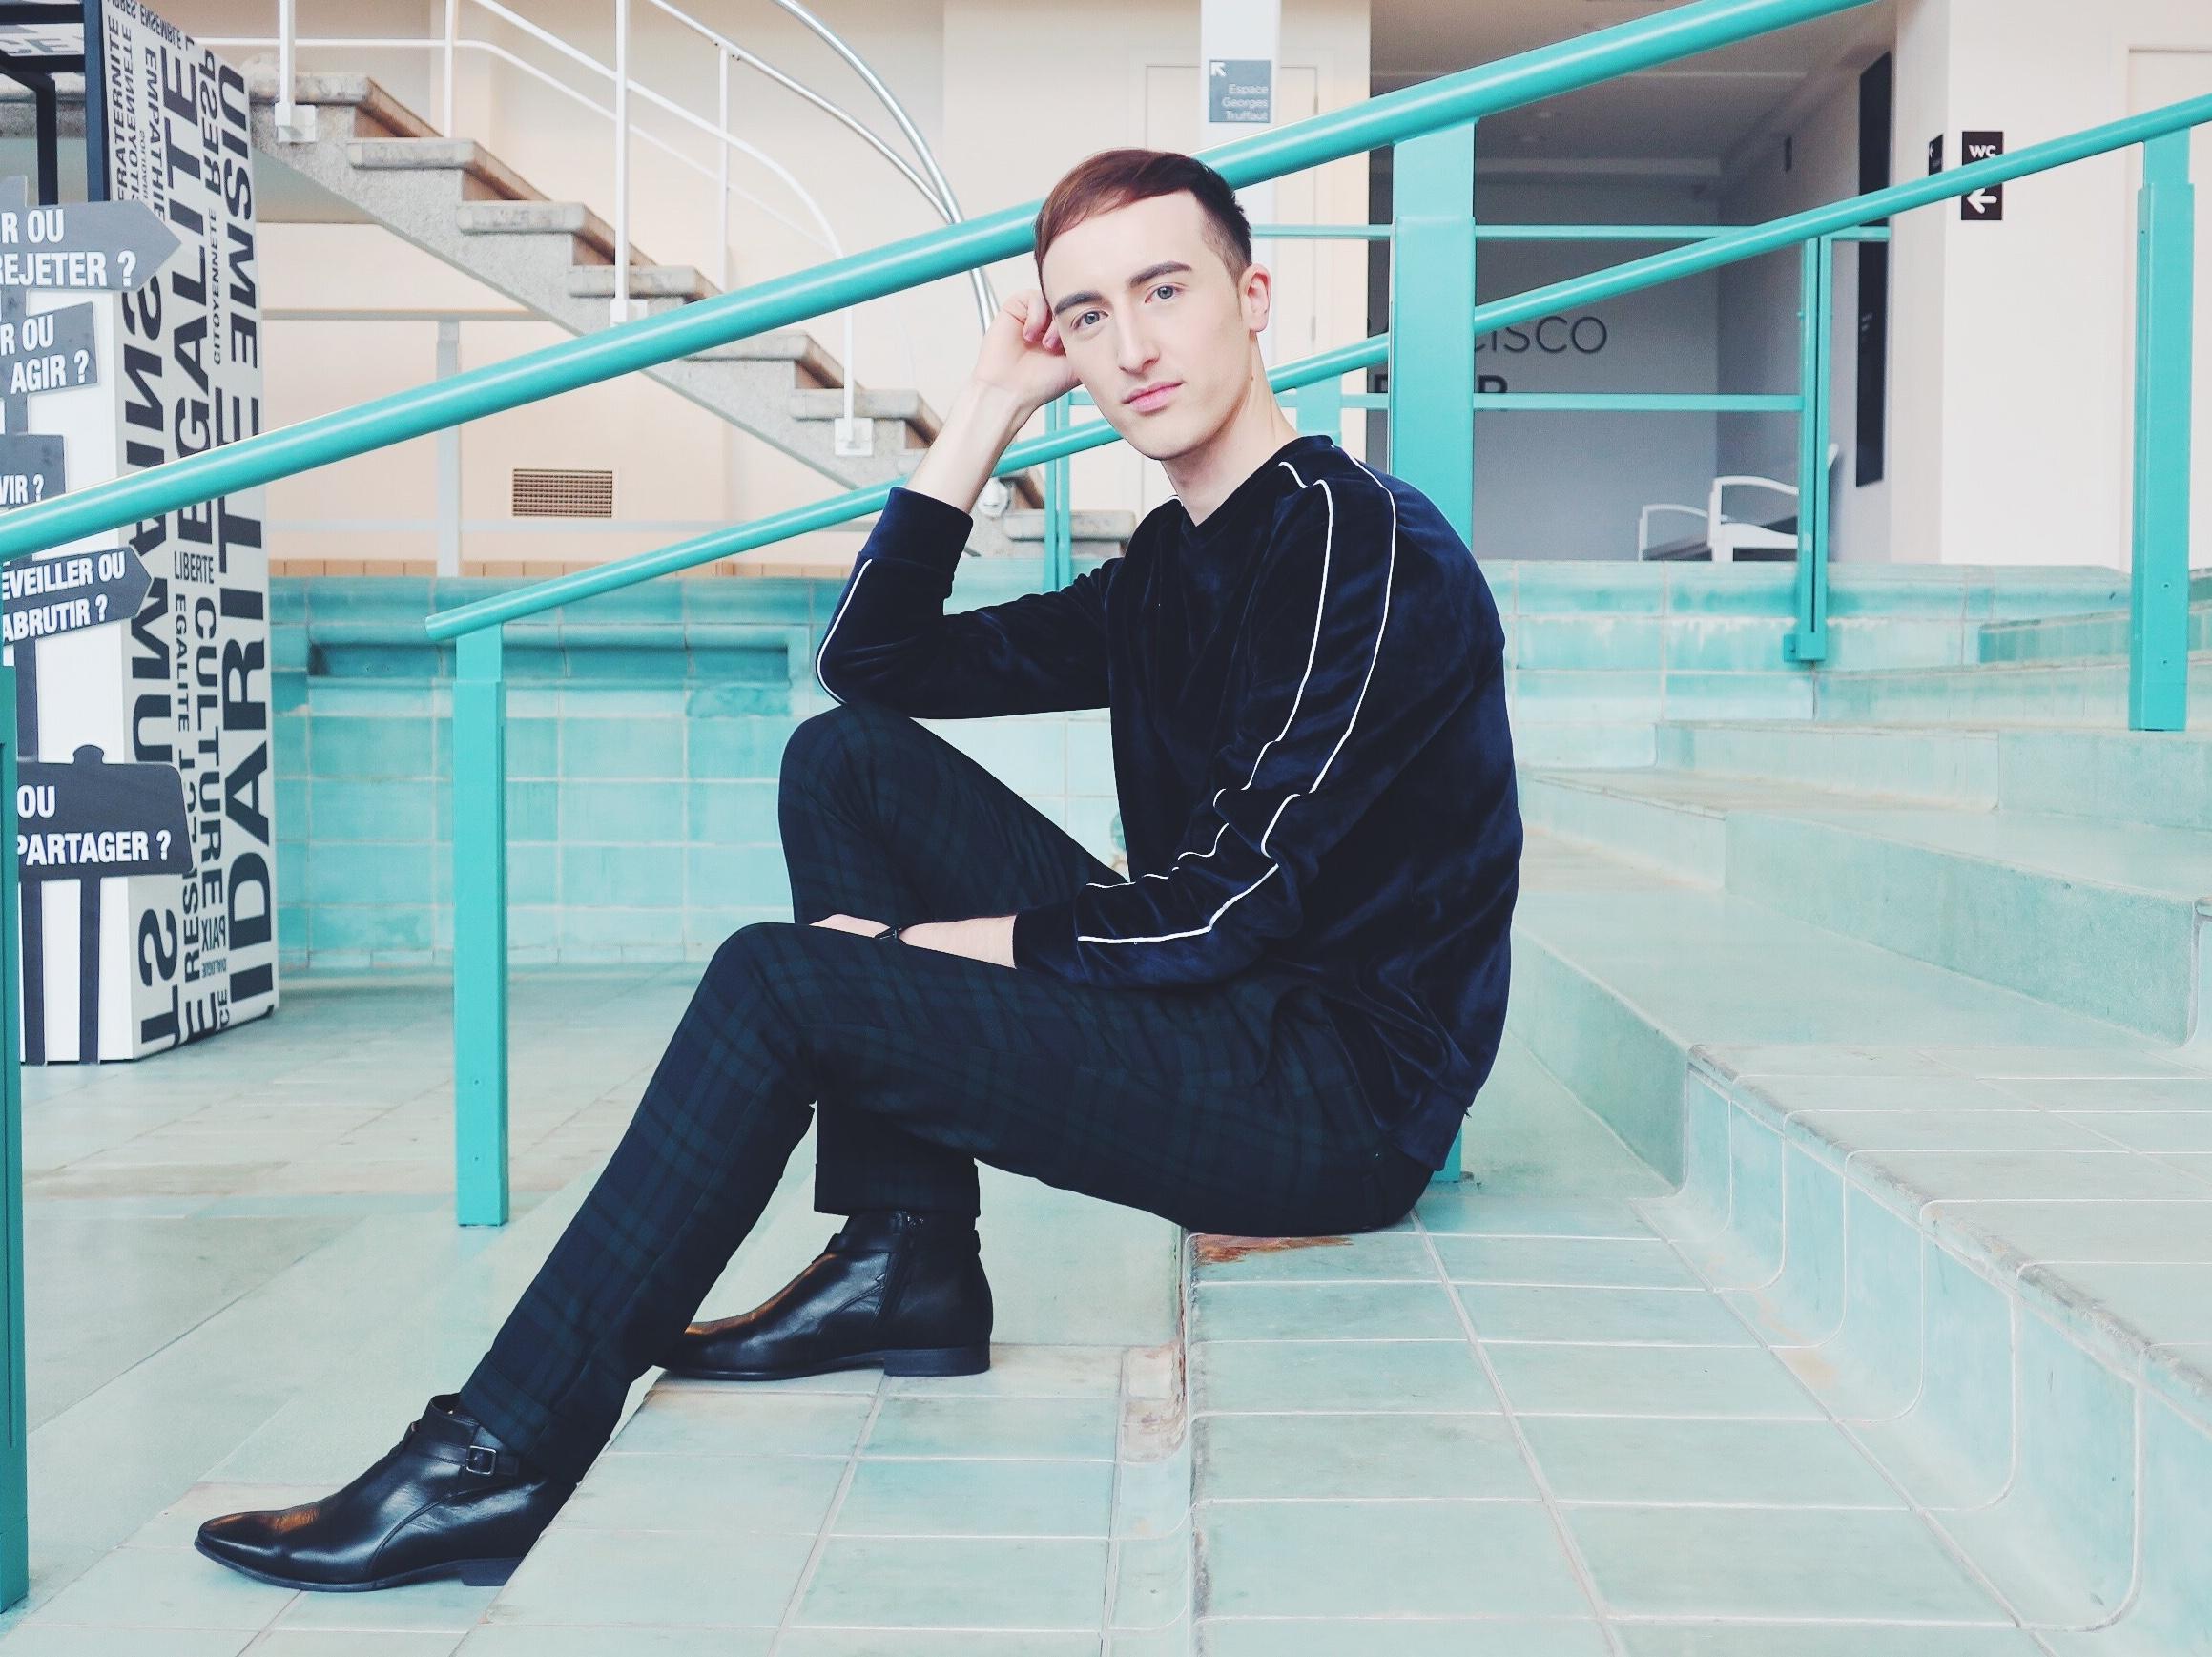 Topman sweater - Pier One trousers via Zalando - Sacha ankle boots - Komono watch